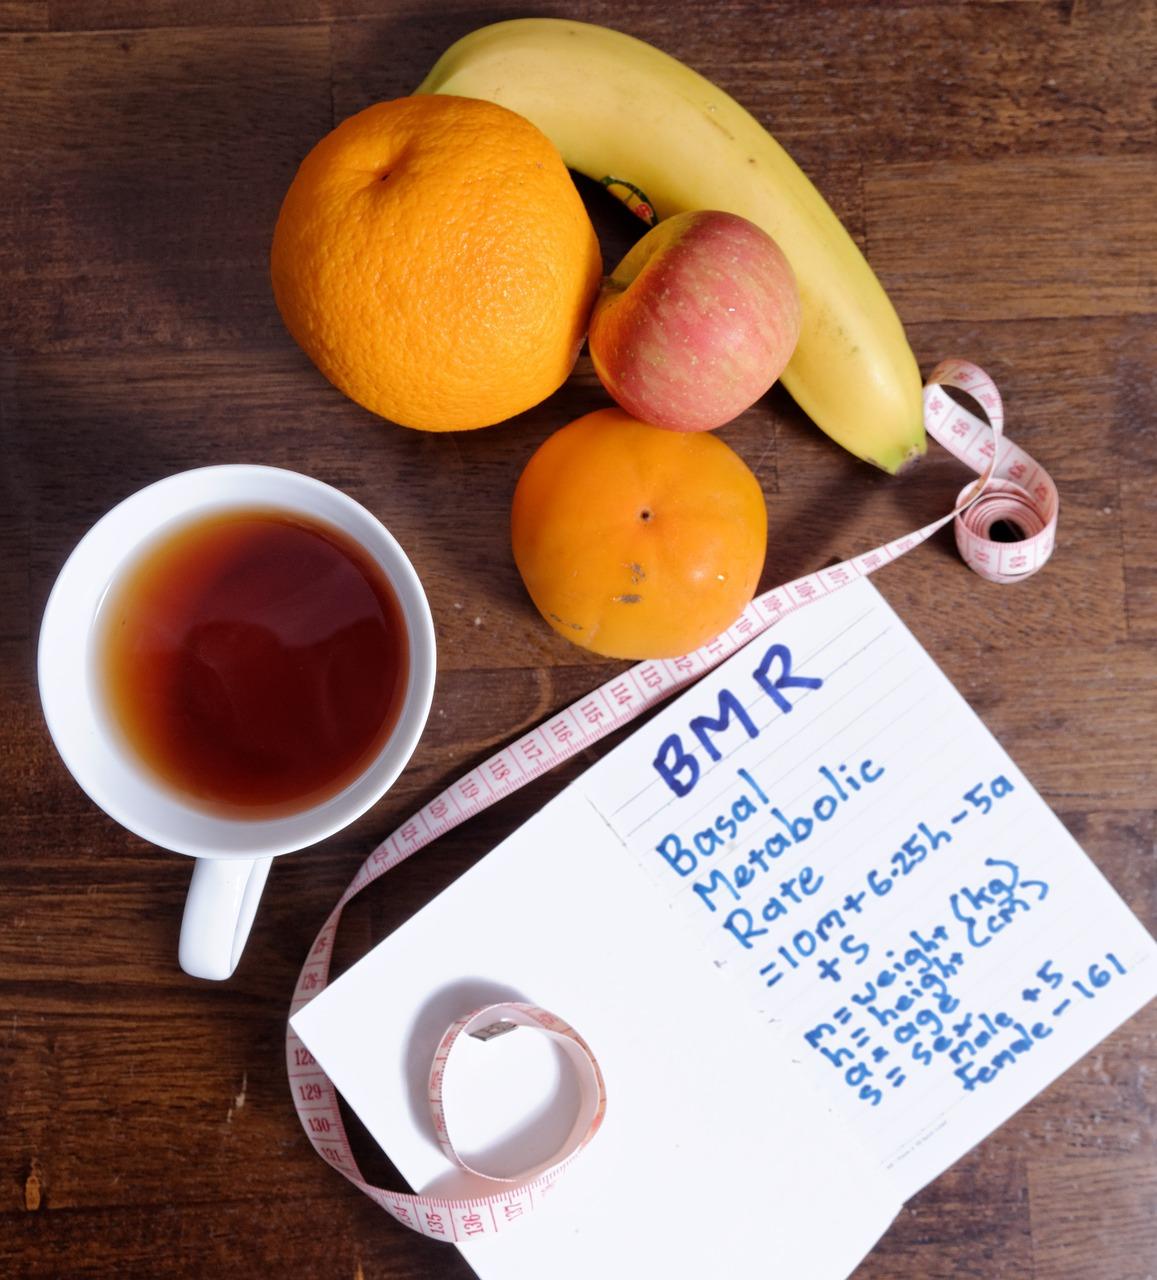 Tri mita o metabolizmu